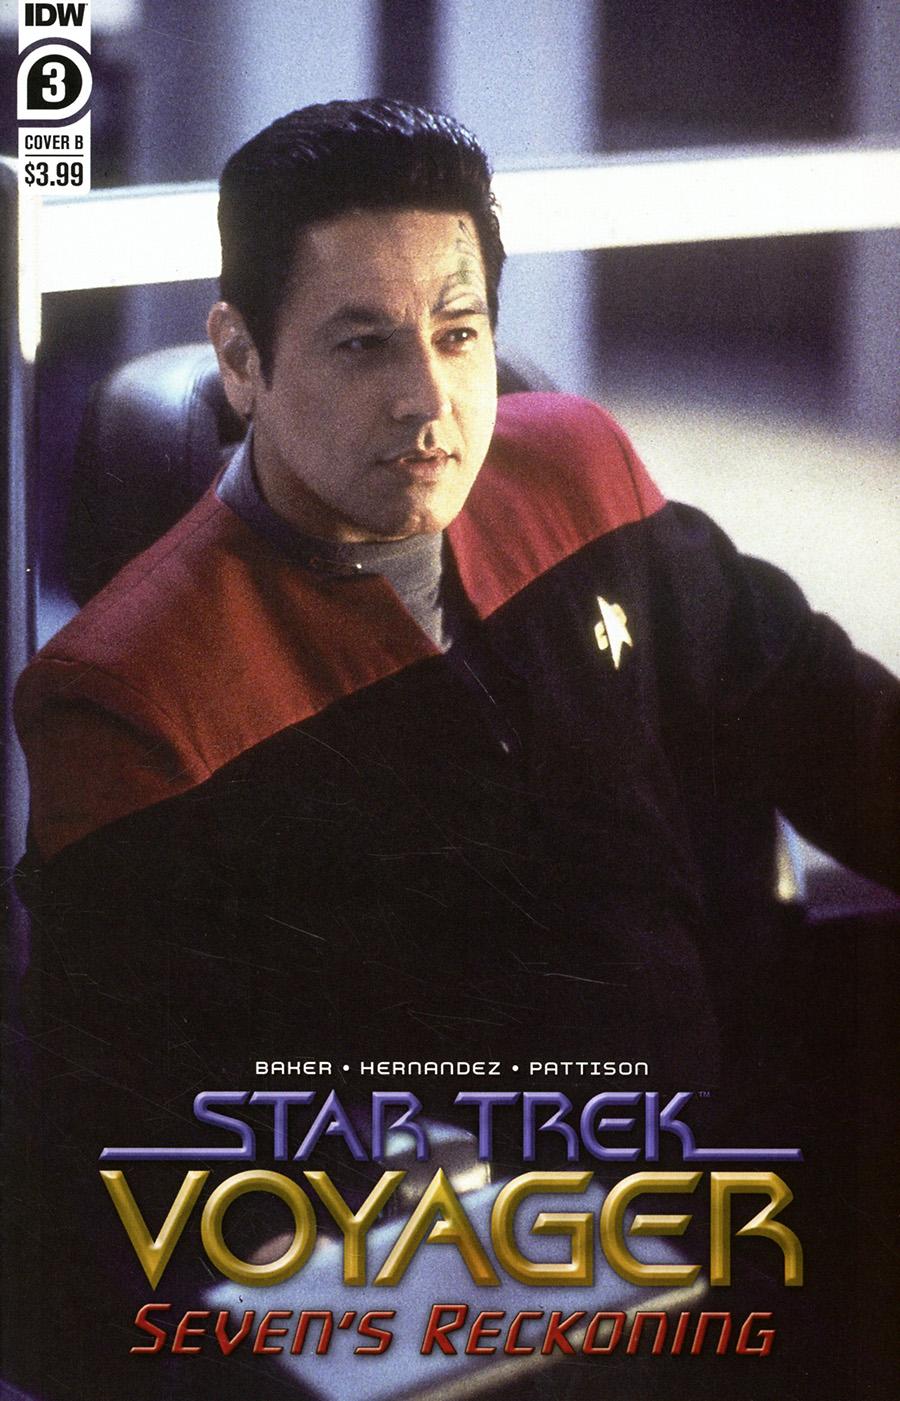 Star Trek Voyager Sevens Reckoning #3 Cover B Variant Photo Cover